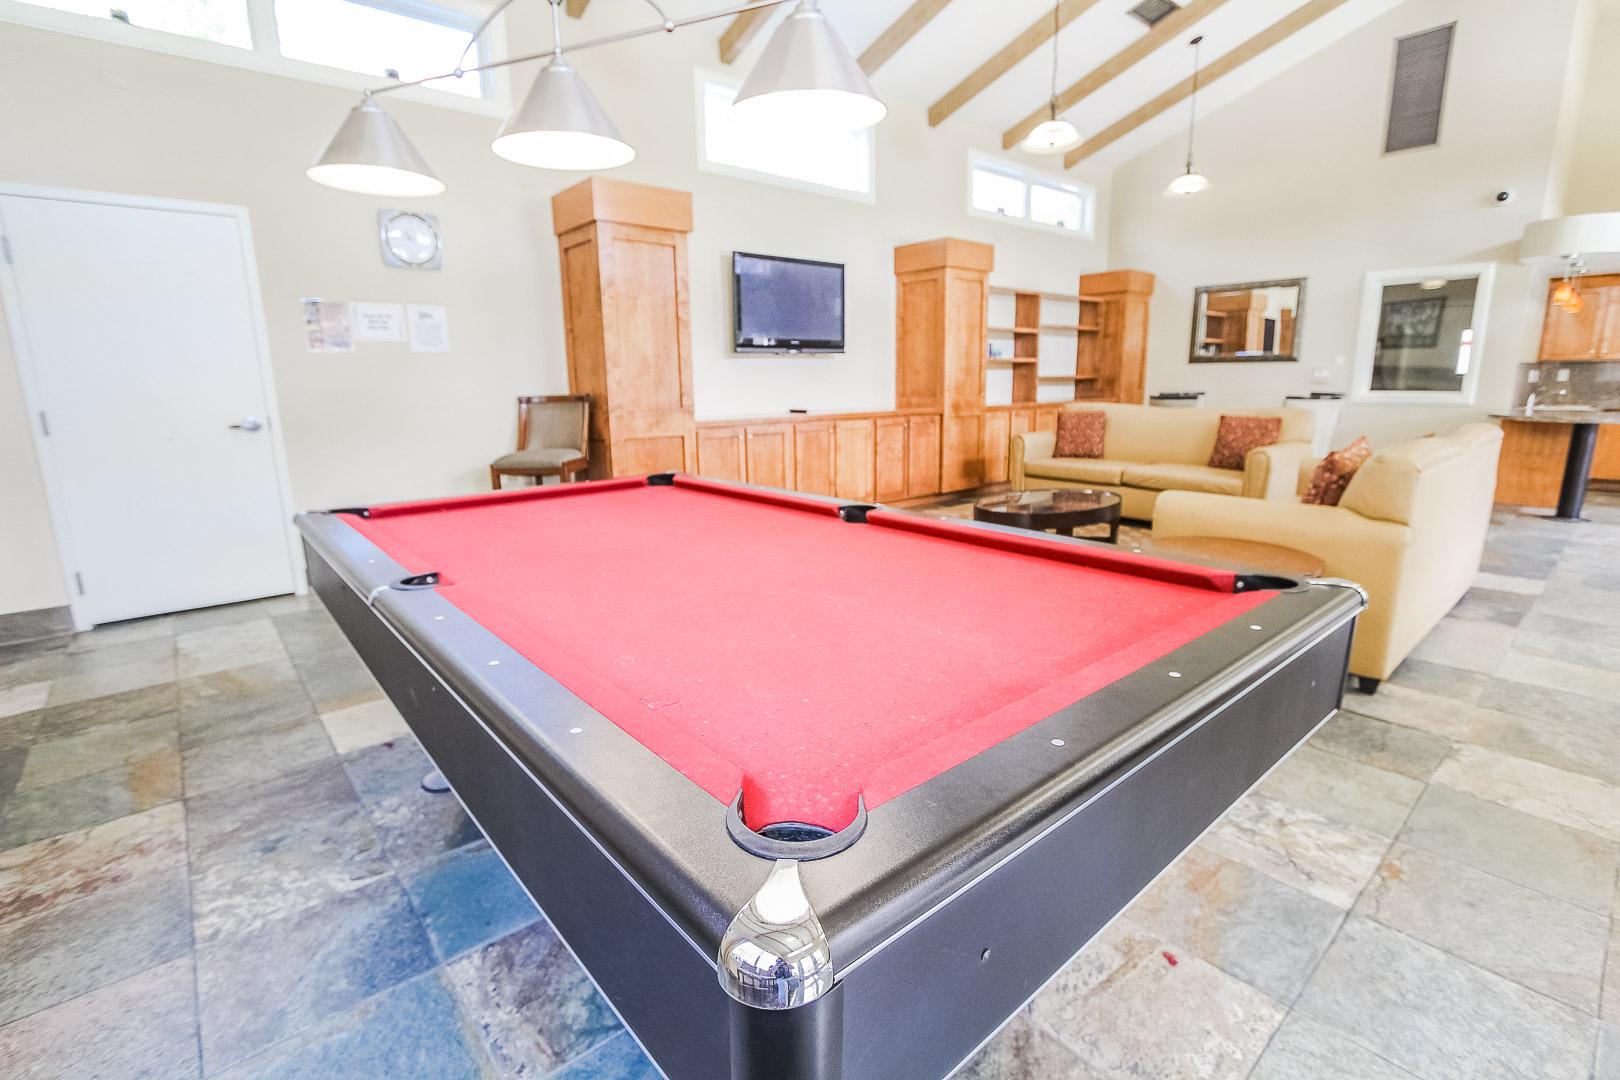 A vibrant pool table at VRI's Winner Circle Resort in California.